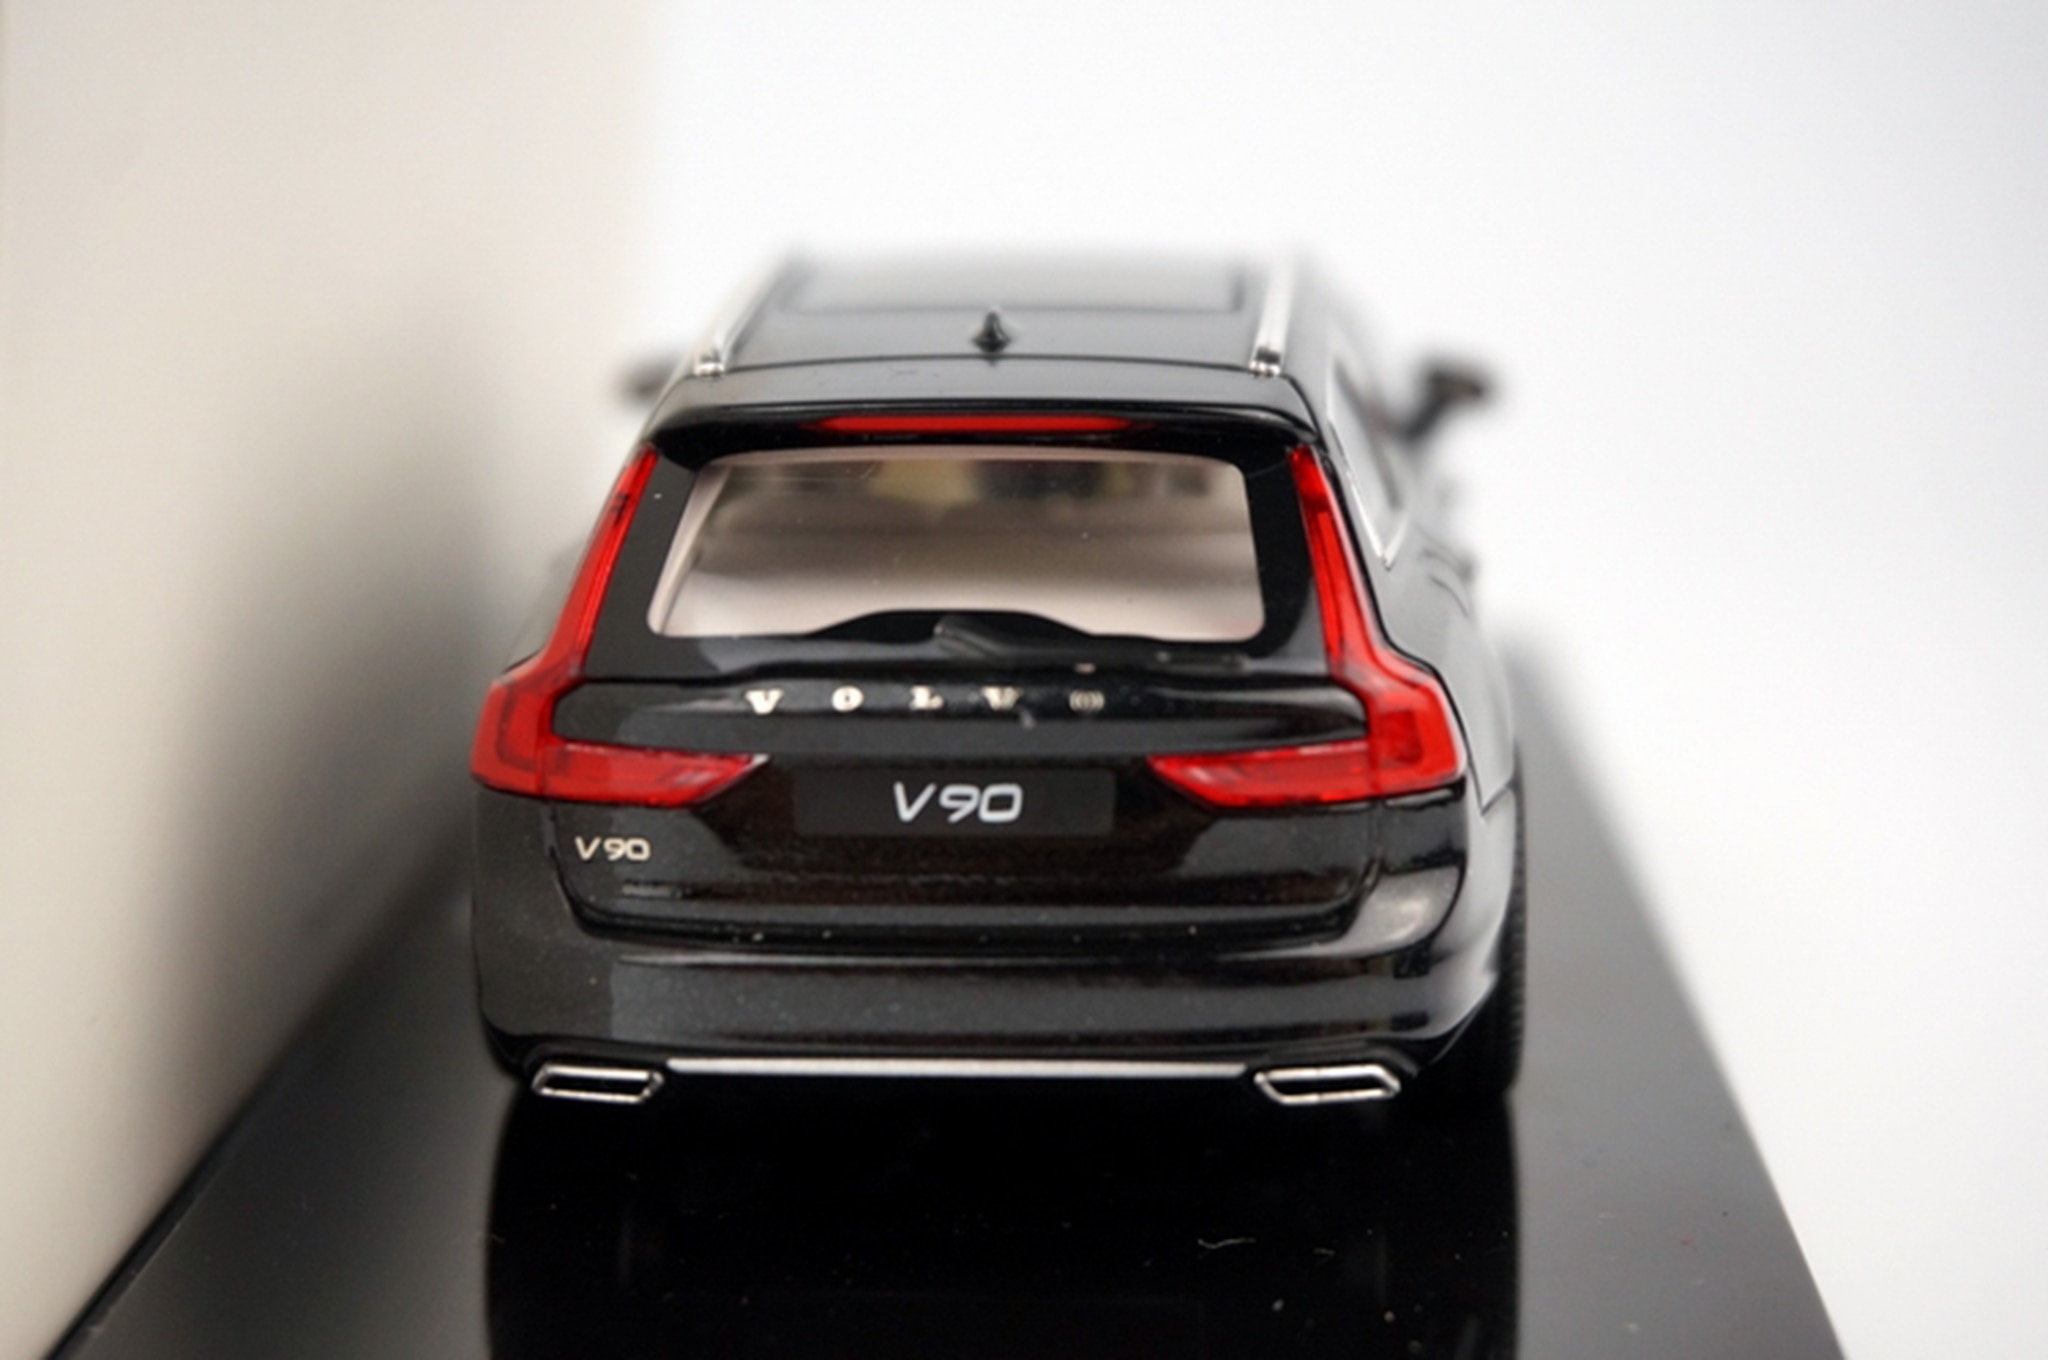 volvo v90 wagon es revelado en modelo a escala. Black Bedroom Furniture Sets. Home Design Ideas